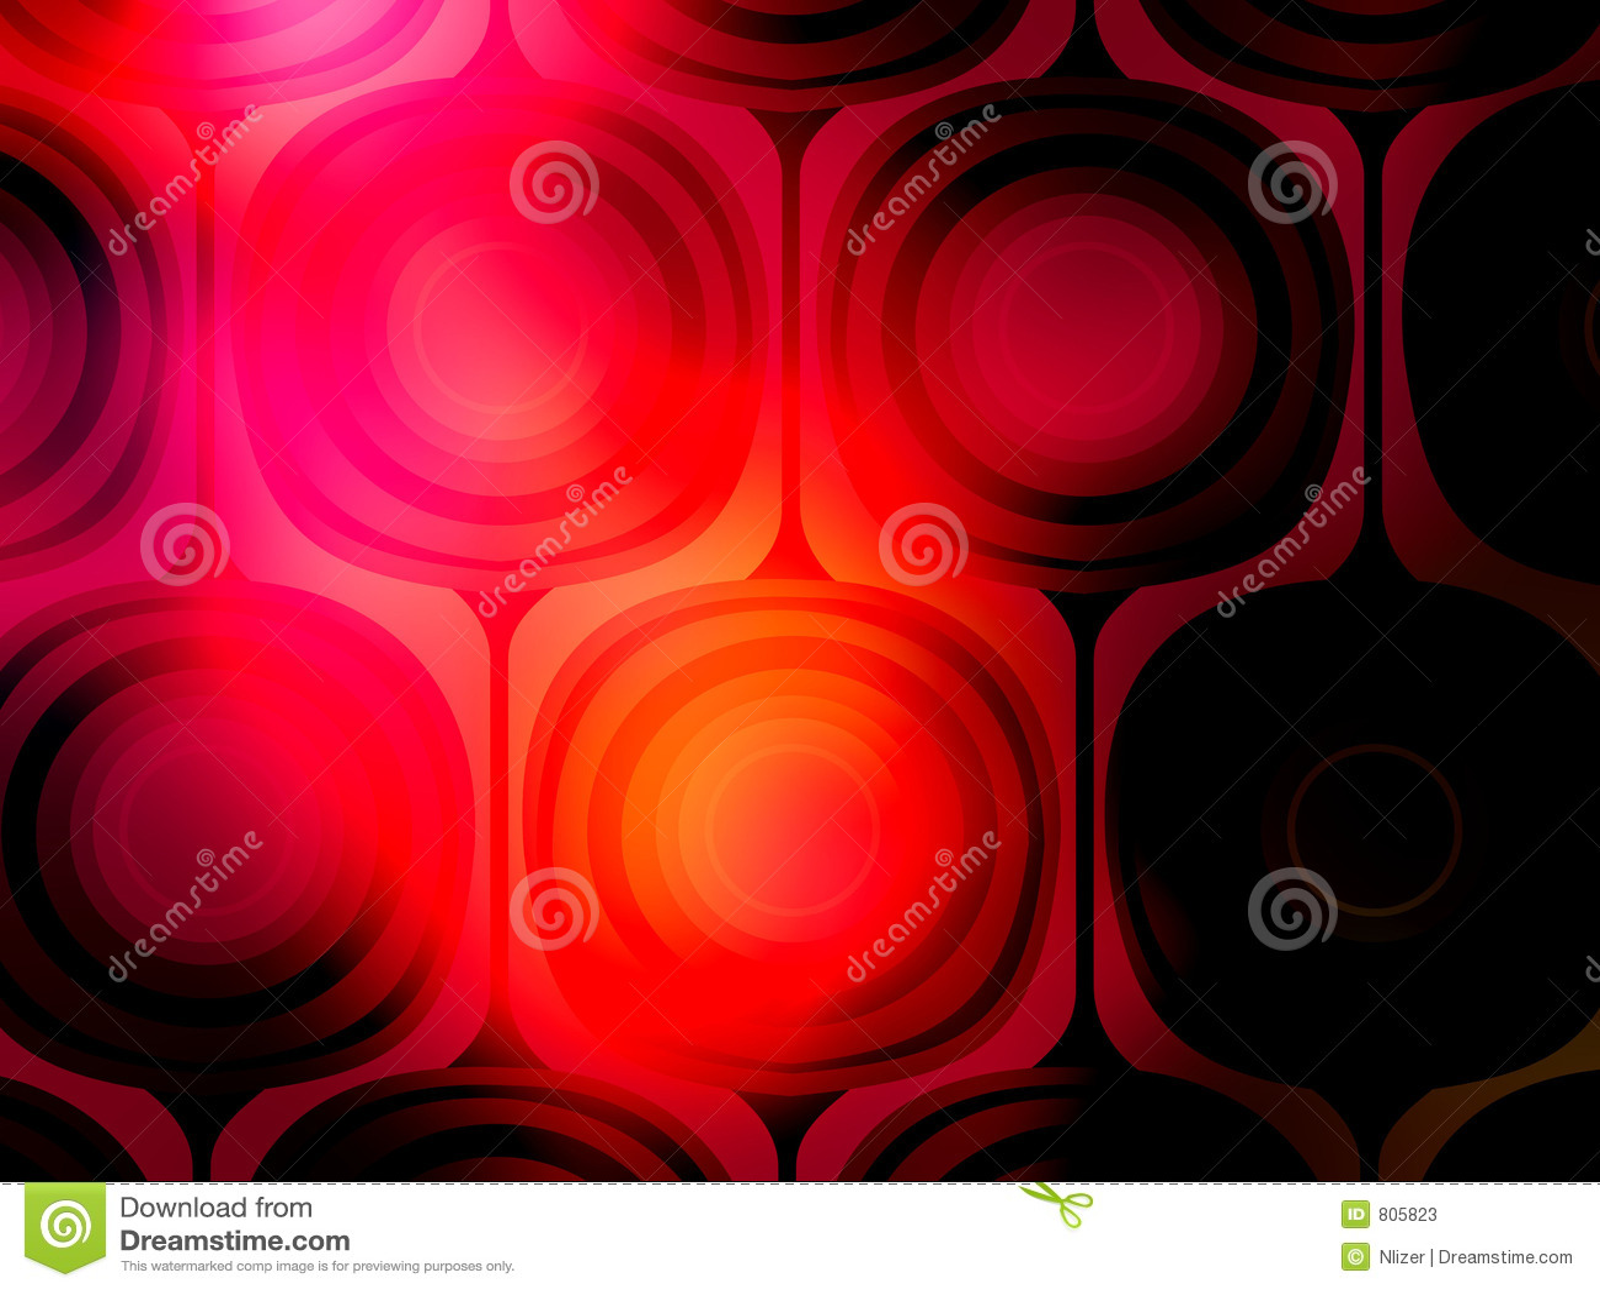 Vibrant red black mod background wallpaper stock photos - Vibrant background ...